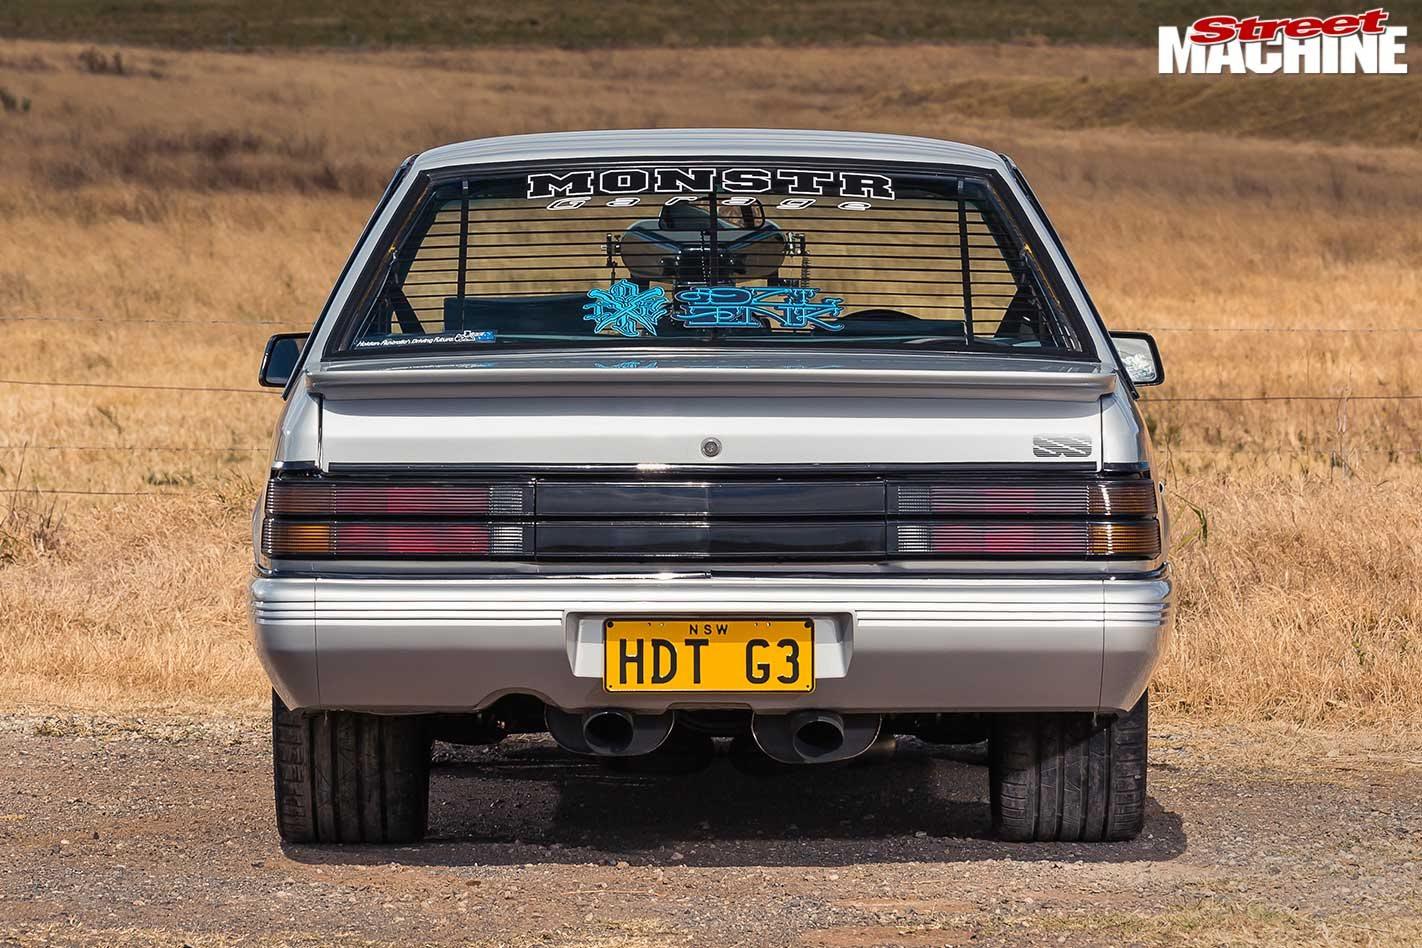 Blown LS3-powered 1985 Holden VK Commodore